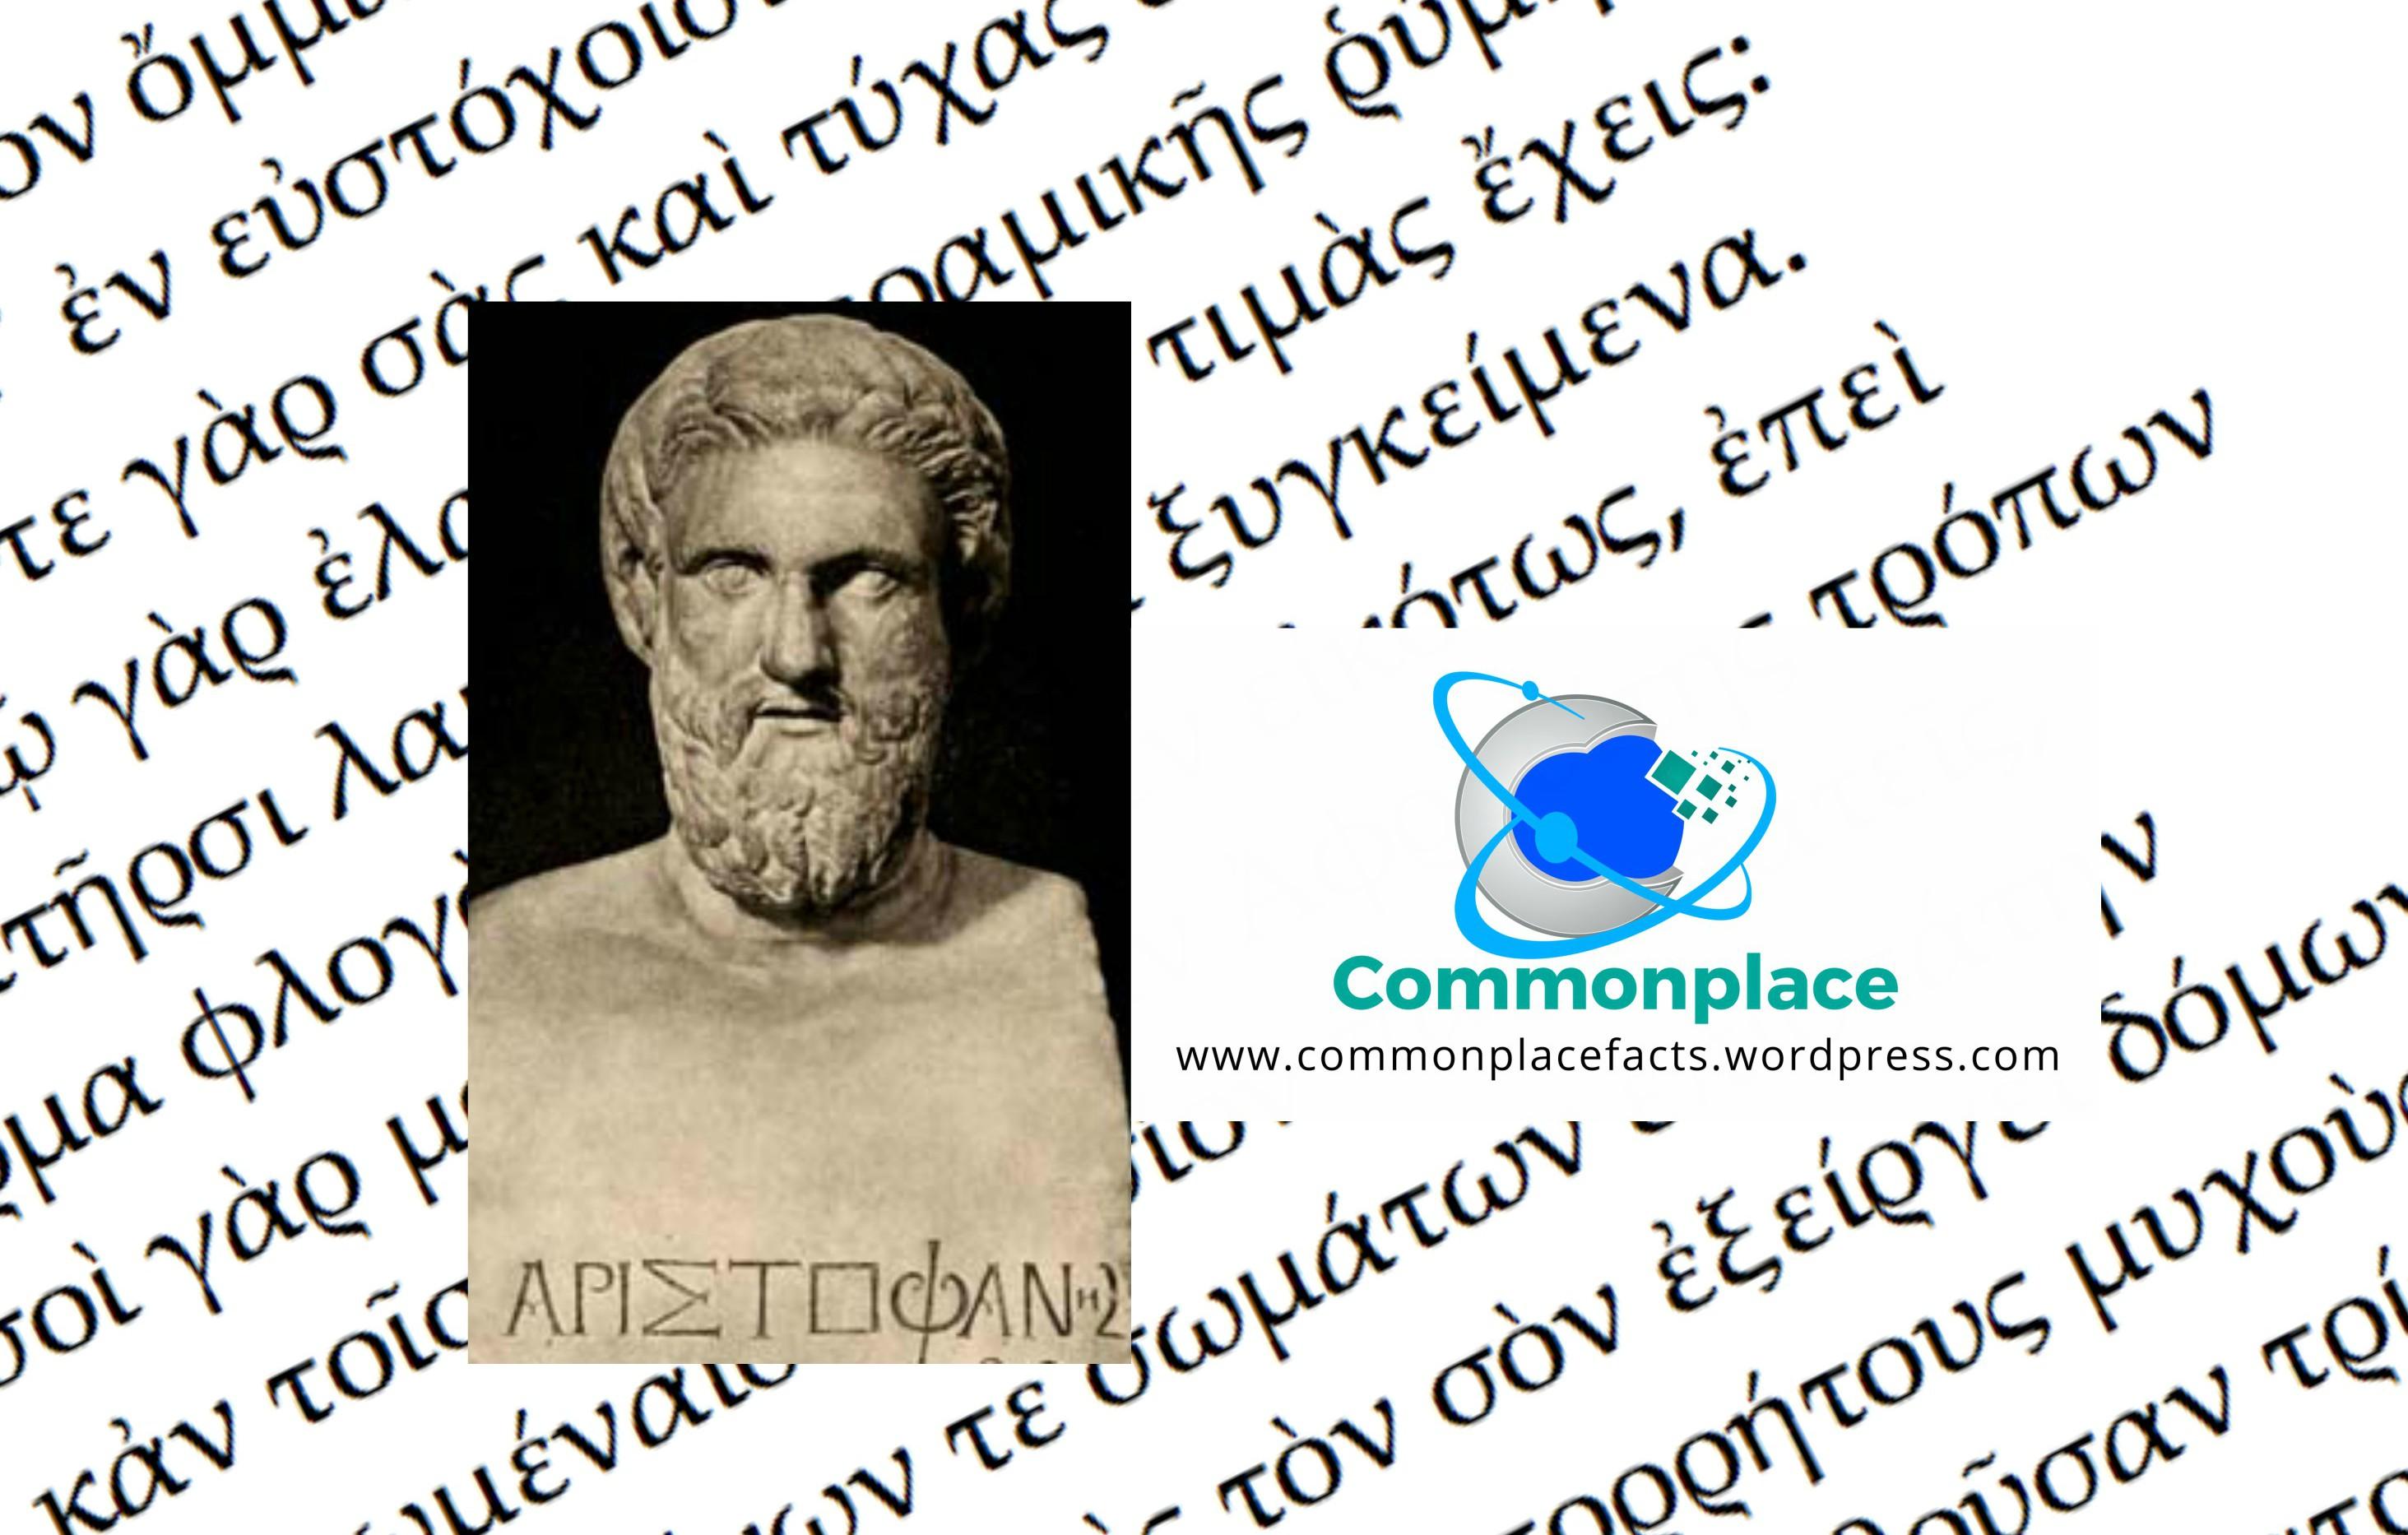 longest word in literature Aristophanes Assemblywomen